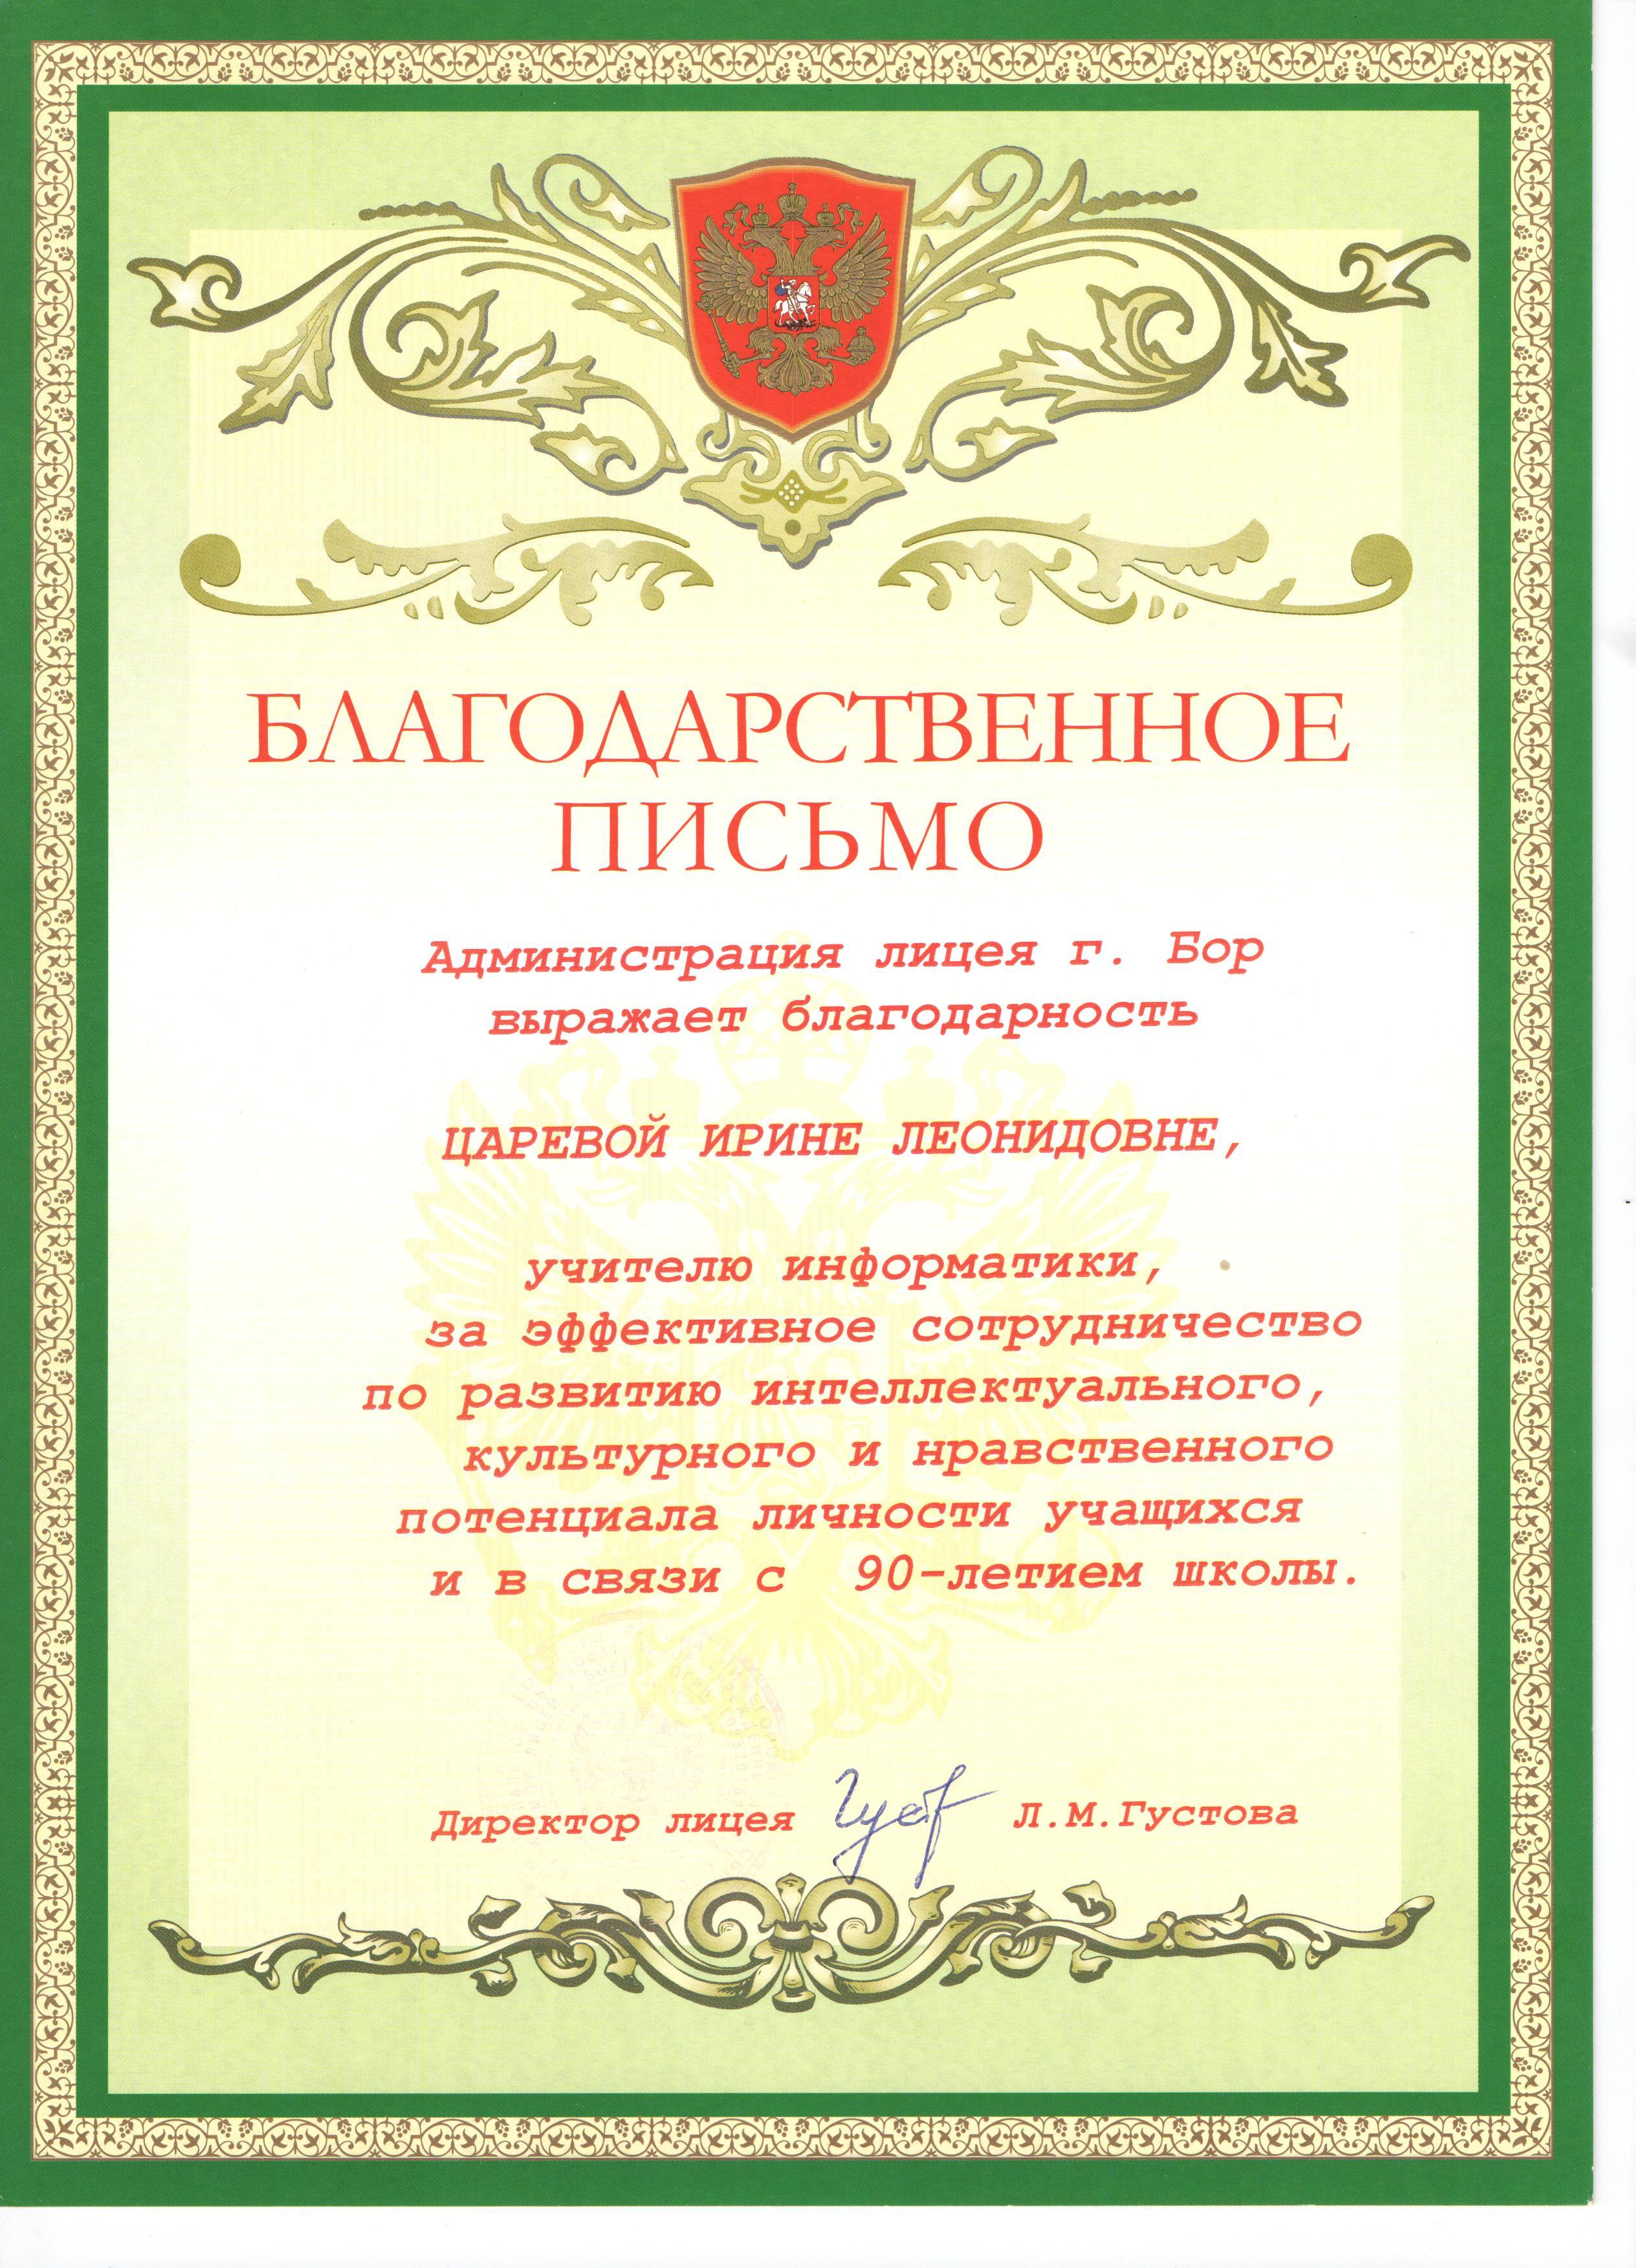 http://agptech.in/pdf/t%C3%BCrkiyede-milli-%C5%9Fef-d%C3%B6nemi-1938-1945-2007.html